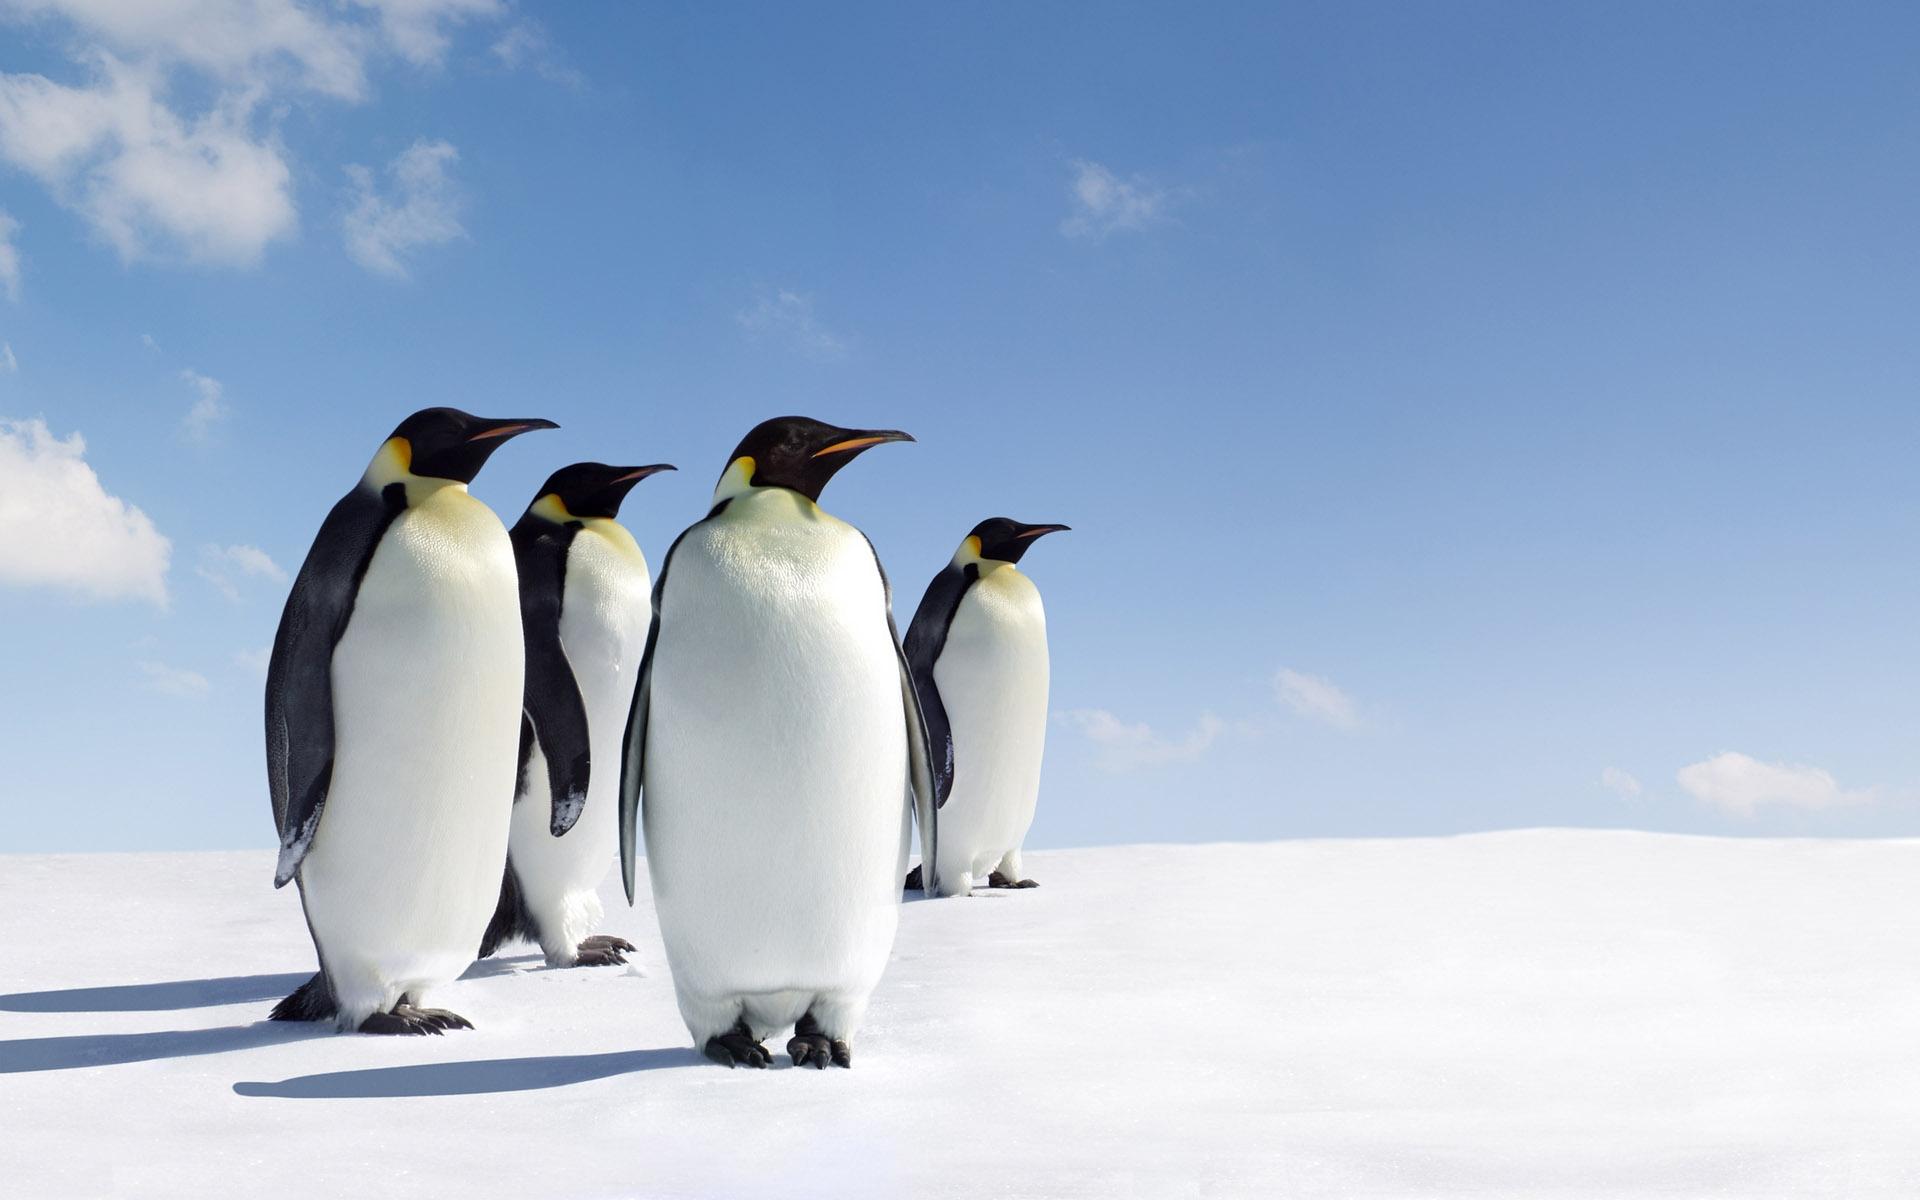 Penguins   Penguins wallpaper 40983090   fanpop 1920x1200